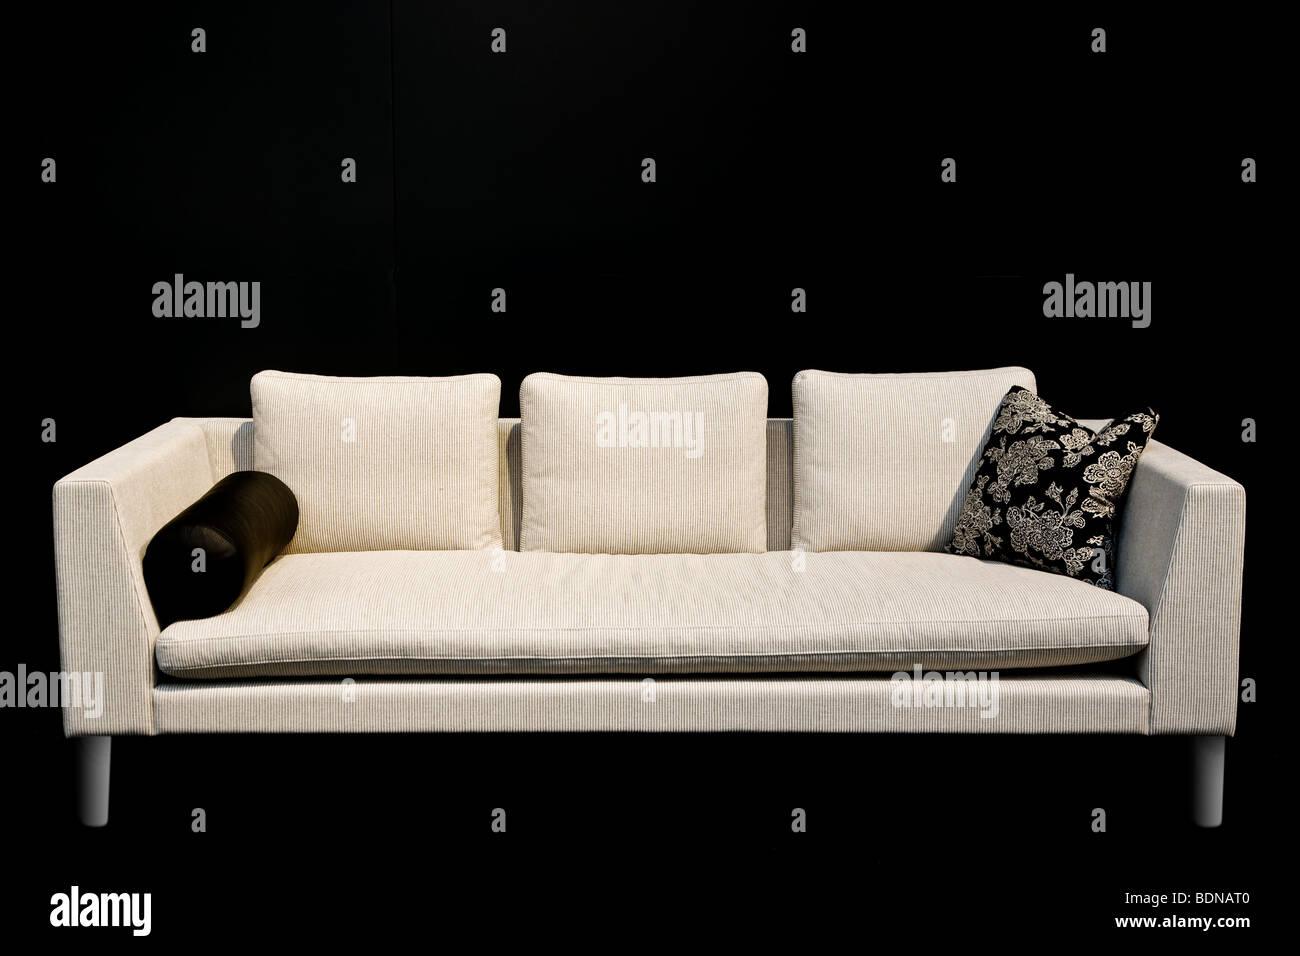 a white designer sofa on black background